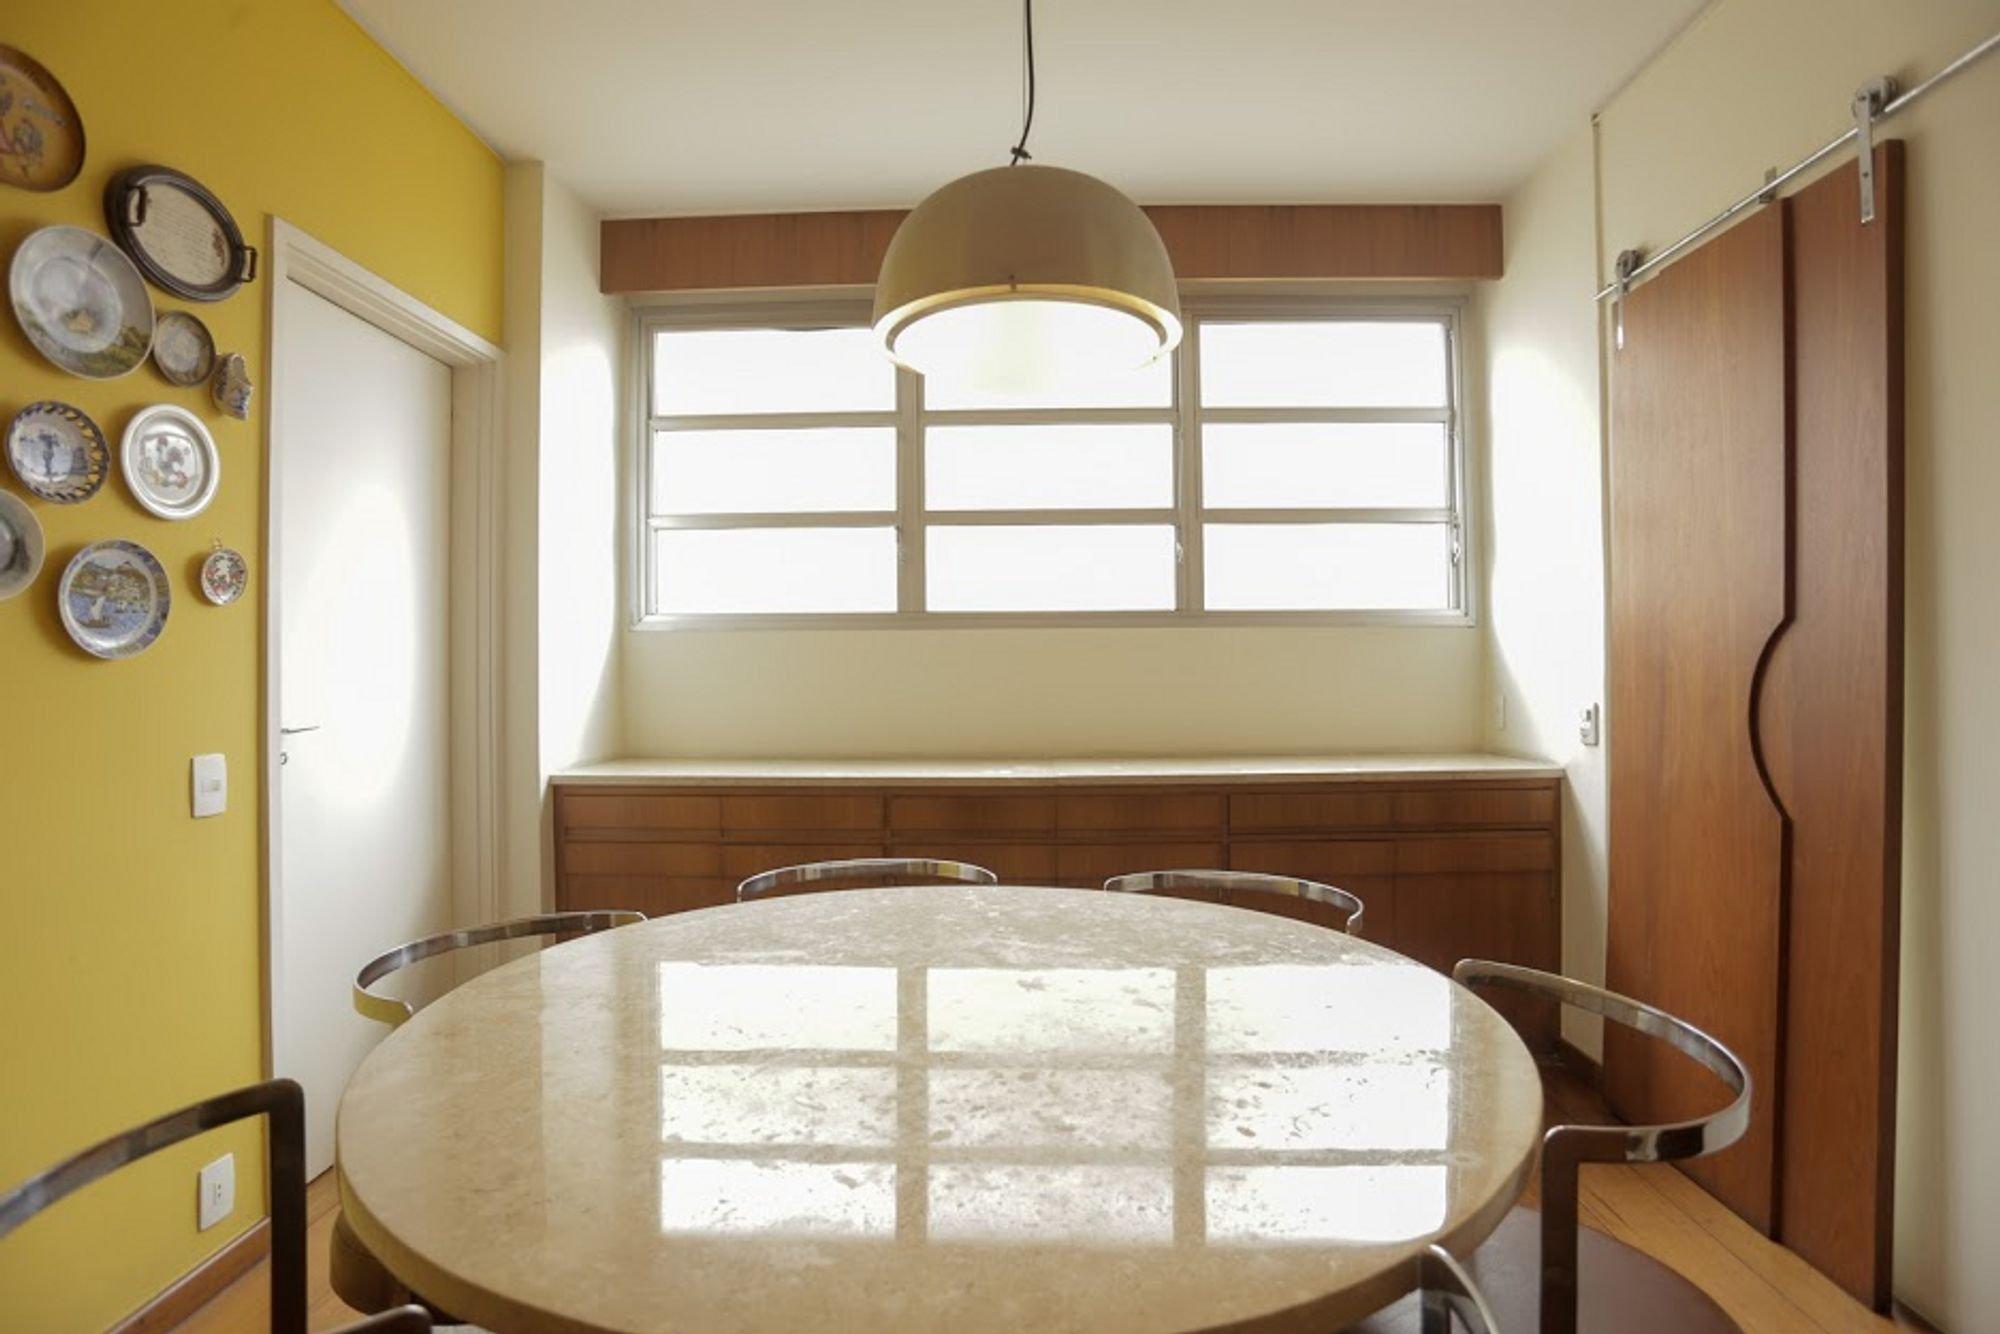 https://content.loft.com.br/homes/7ulomm/desktop_kitchen02.jpg